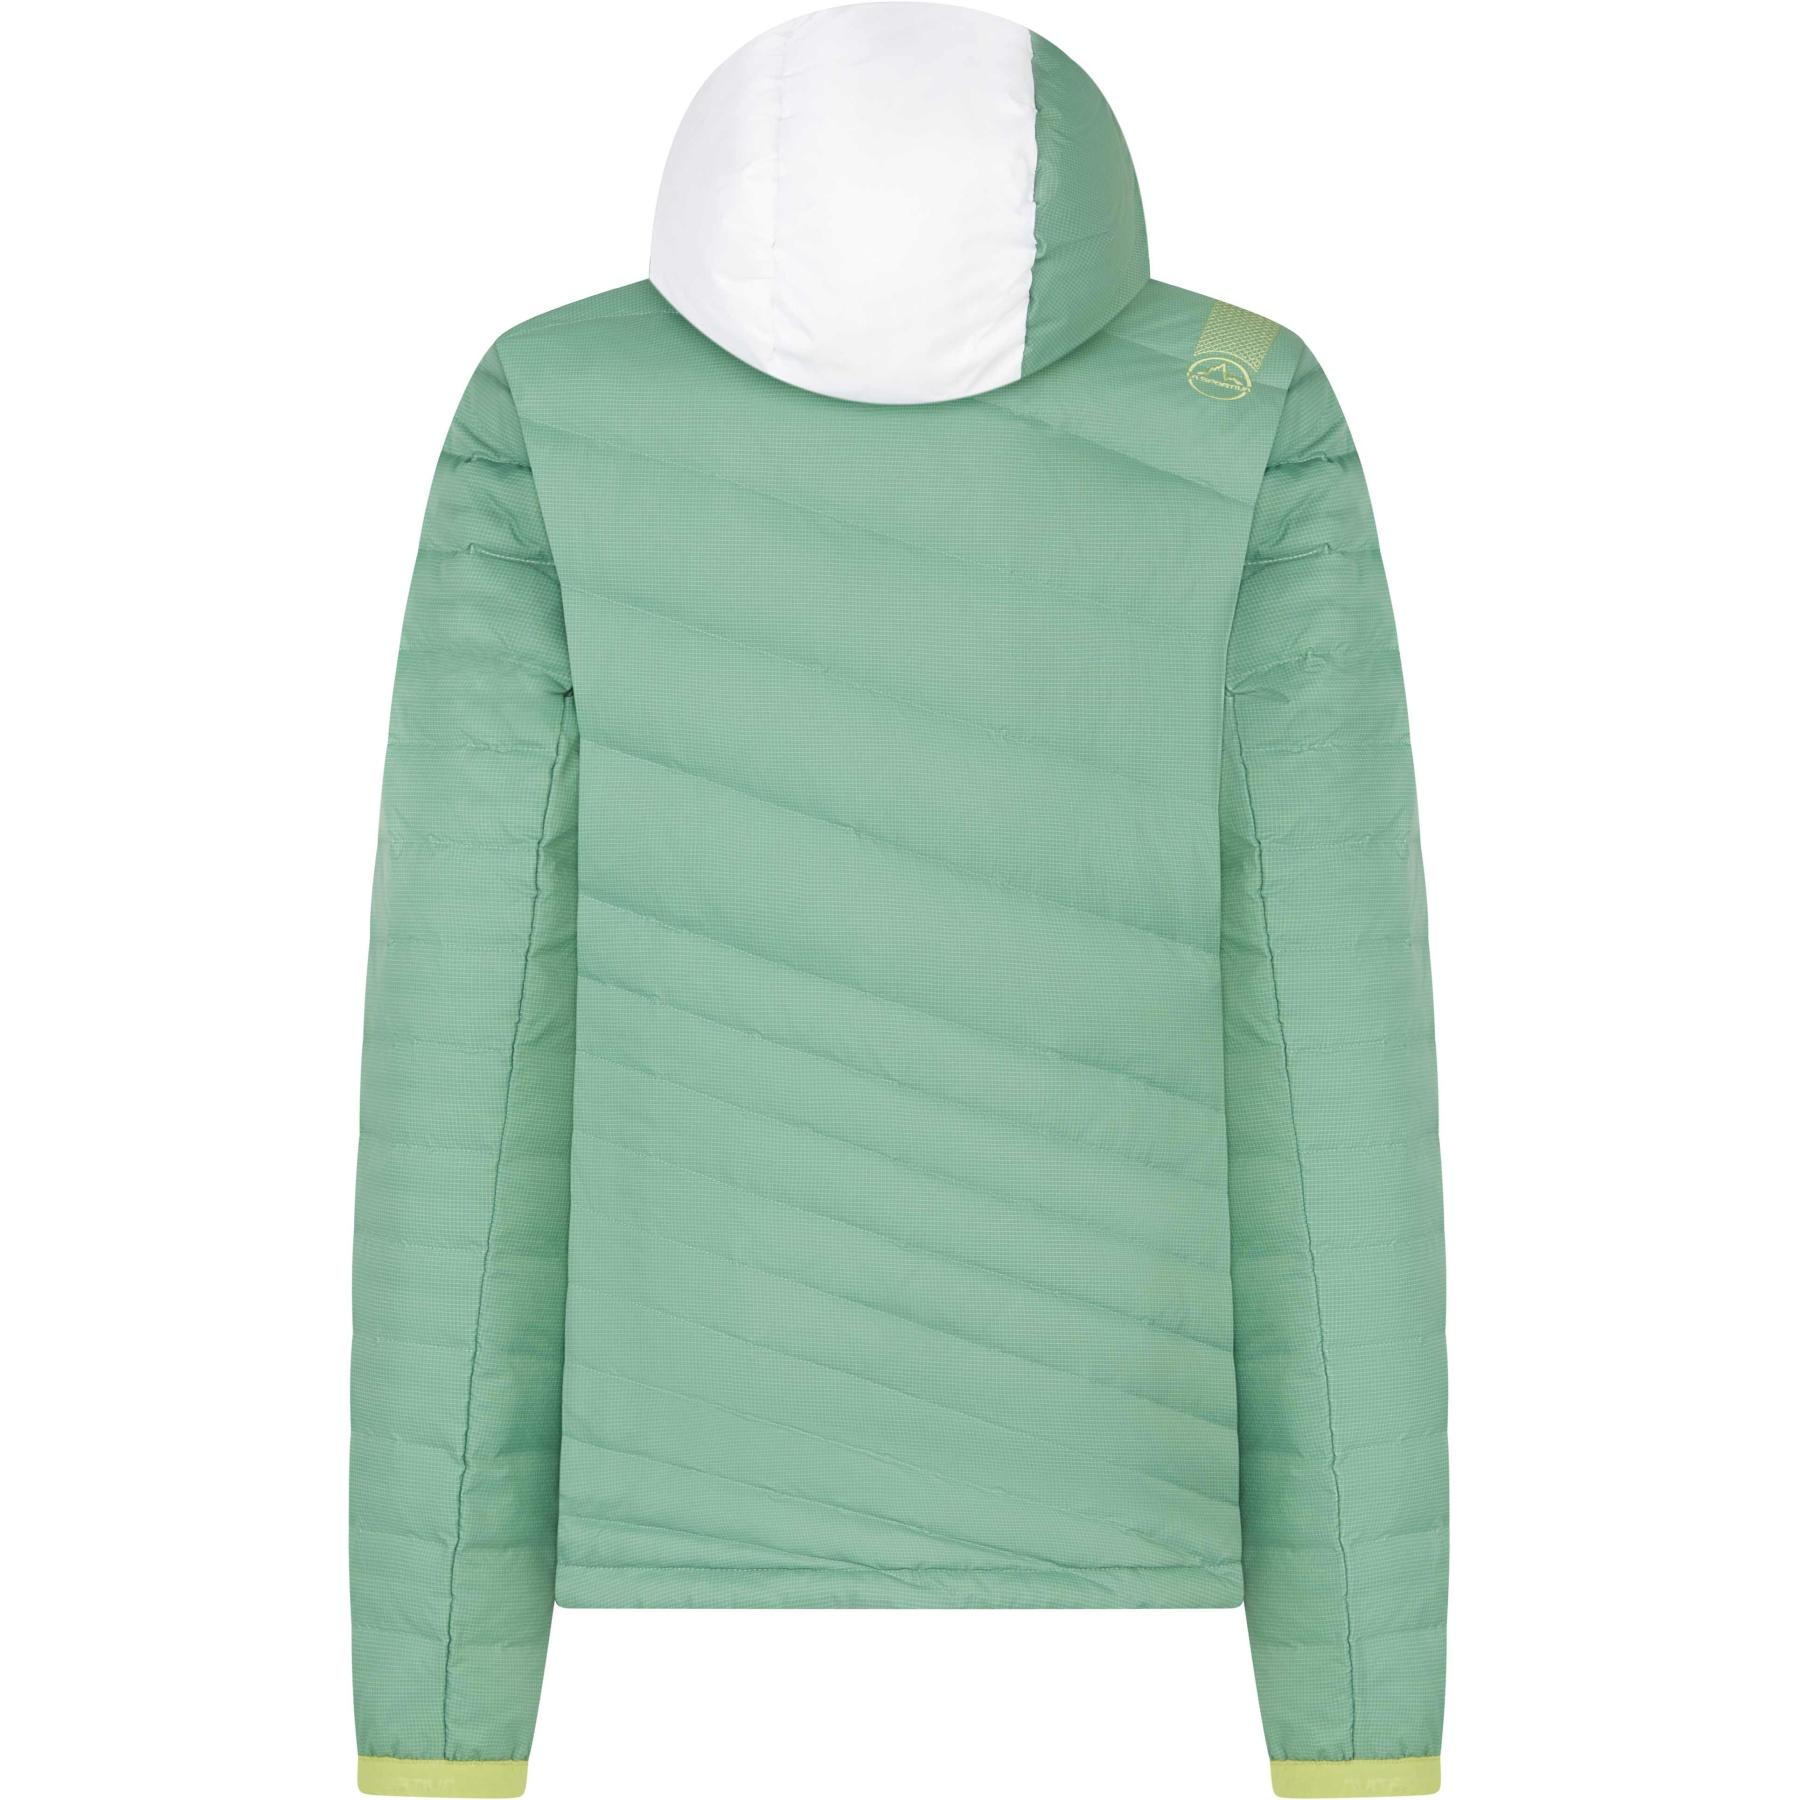 Image of La Sportiva Azaira Down Jacket Women - Grass Green/White